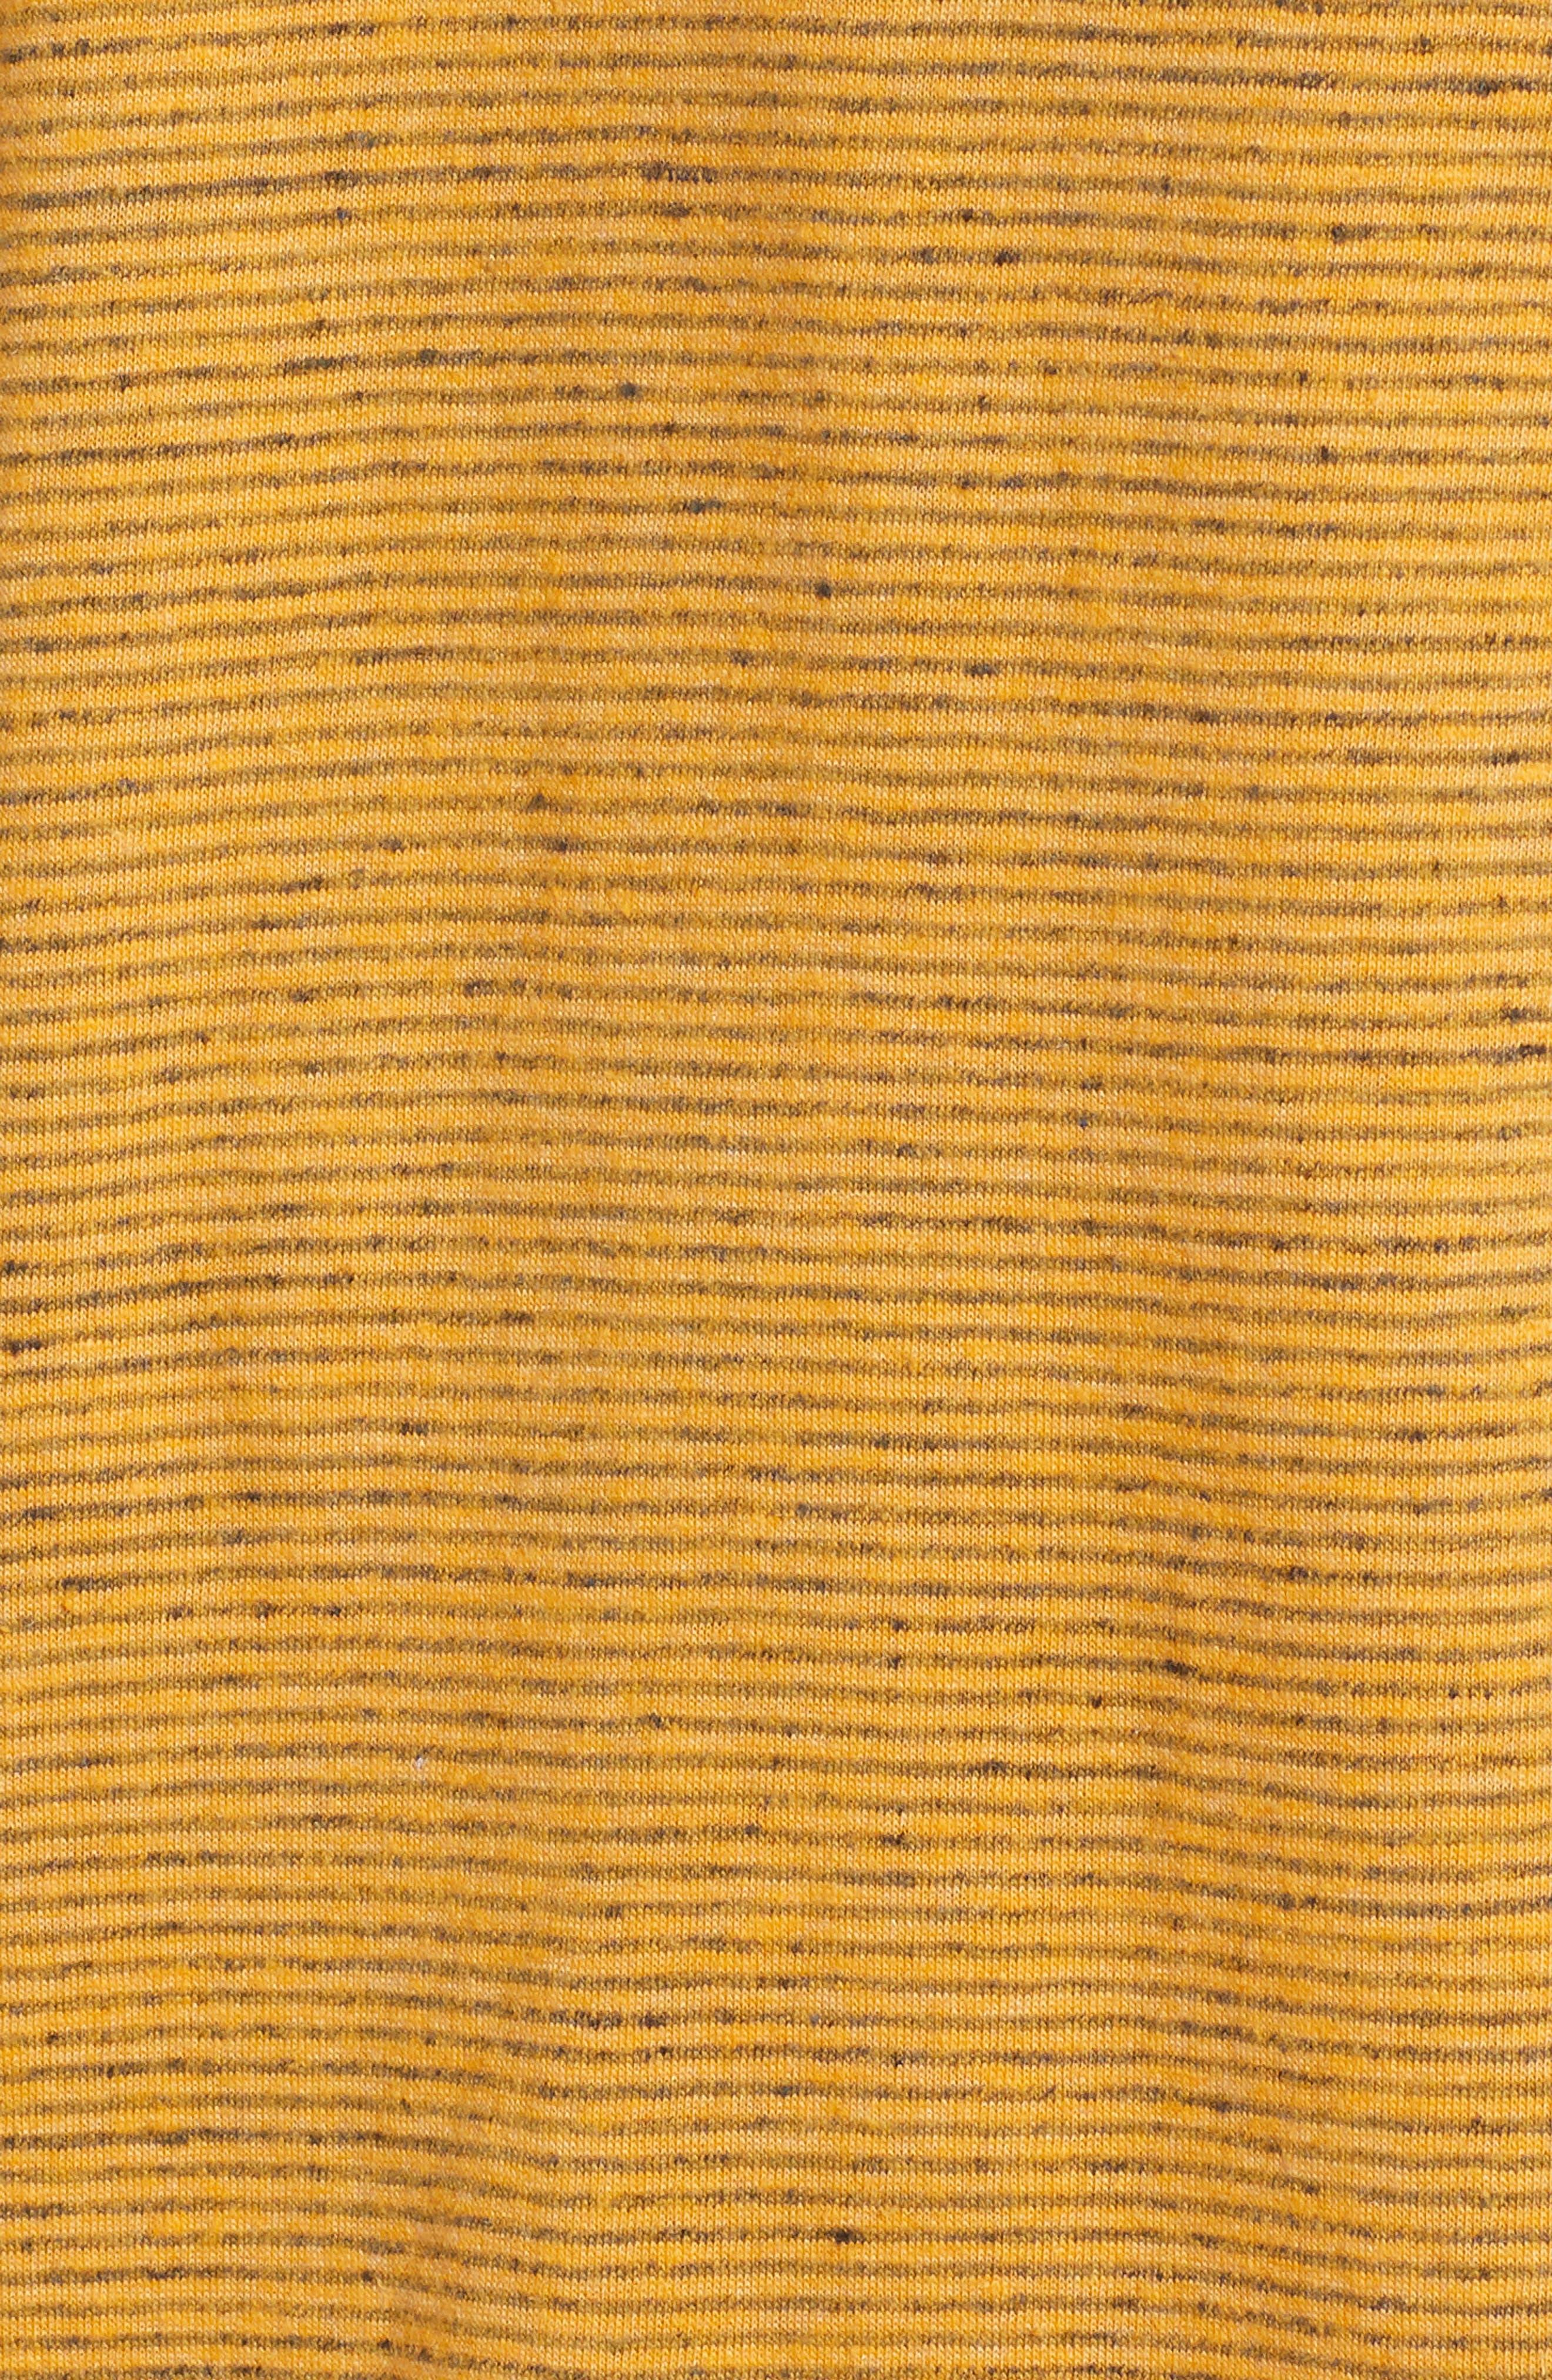 Fine Stripe V-Neck T-Shirt,                             Alternate thumbnail 5, color,                             Orange Lantana Heather Stripe